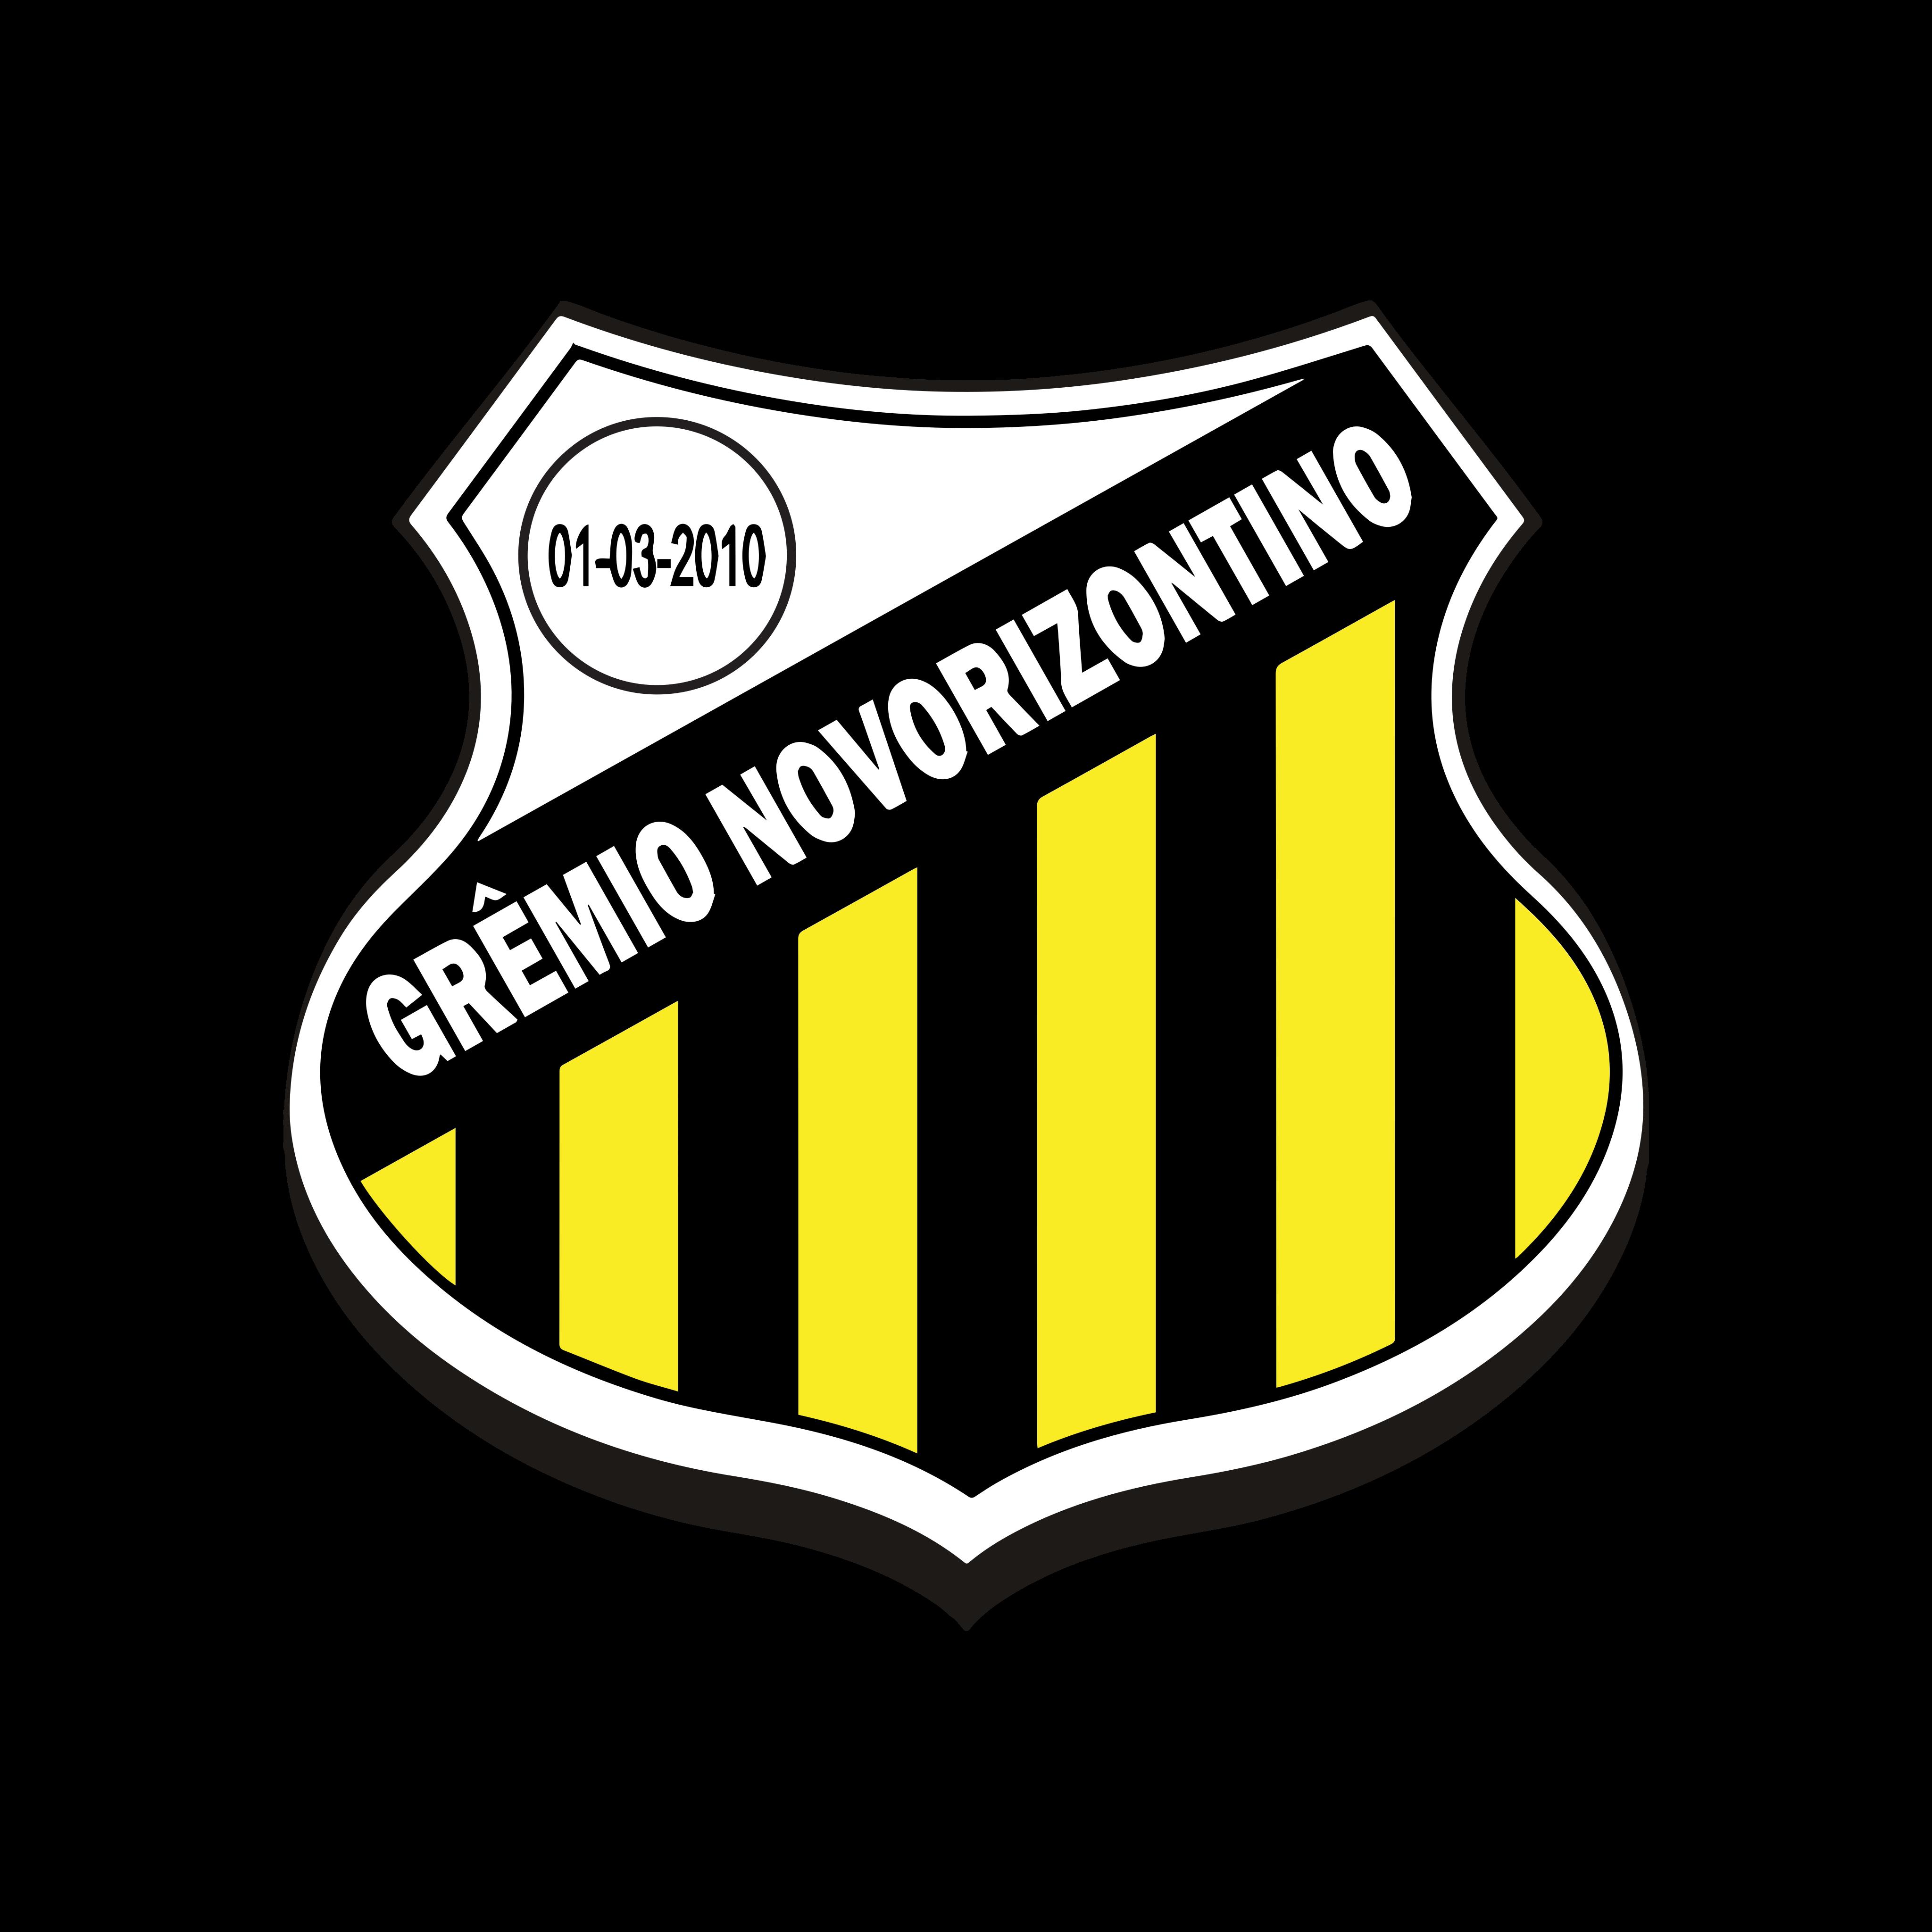 gremio novorizontino logo escudo 0 - Grêmio Novorizontino Logo